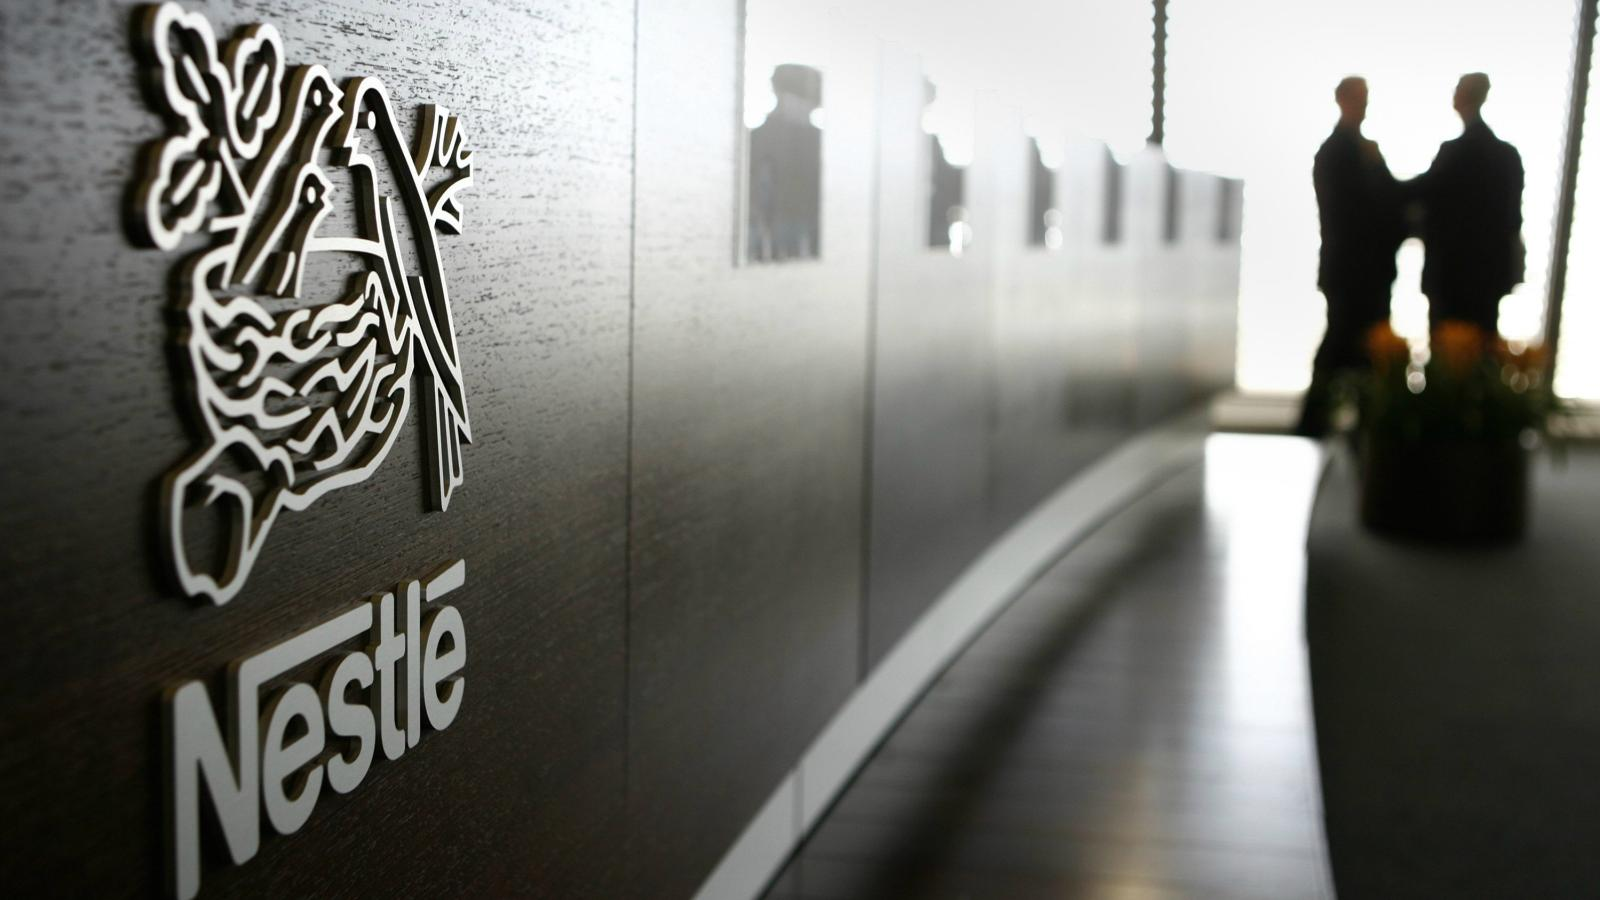 H Nestle, το άνοιγμα στα δερματολογικά και οι νέες επιχειρηματικές κινήσεις